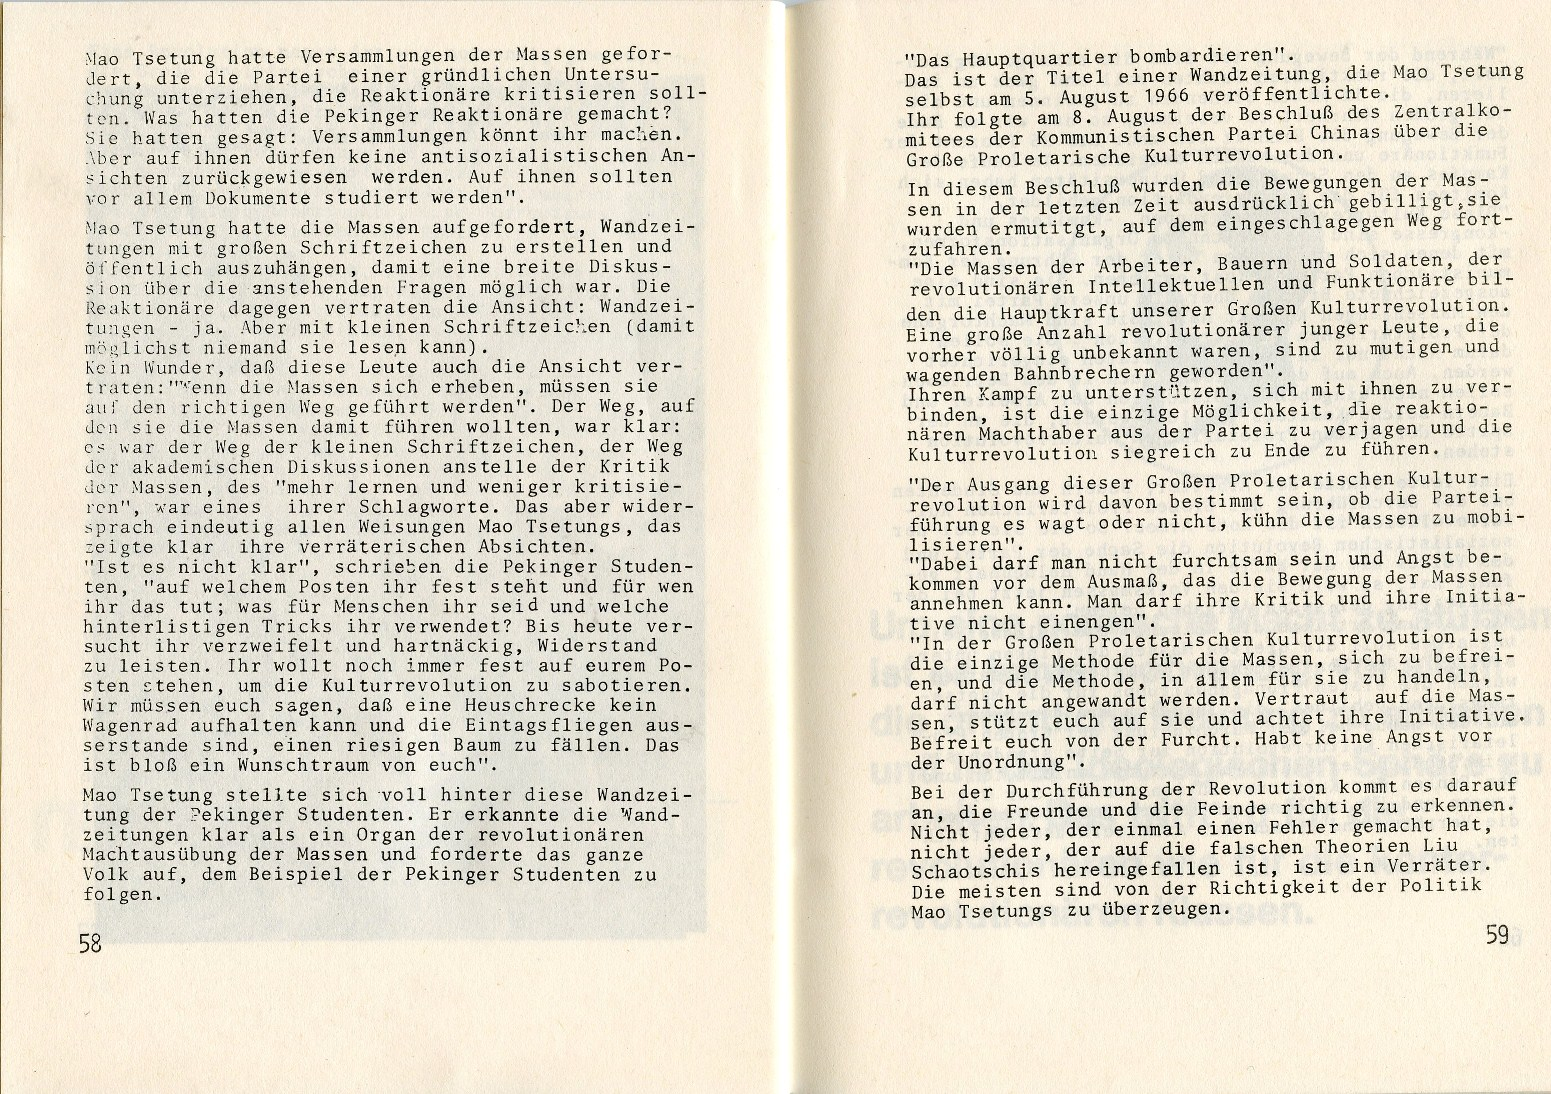 ZB_KPChinas_1971_31